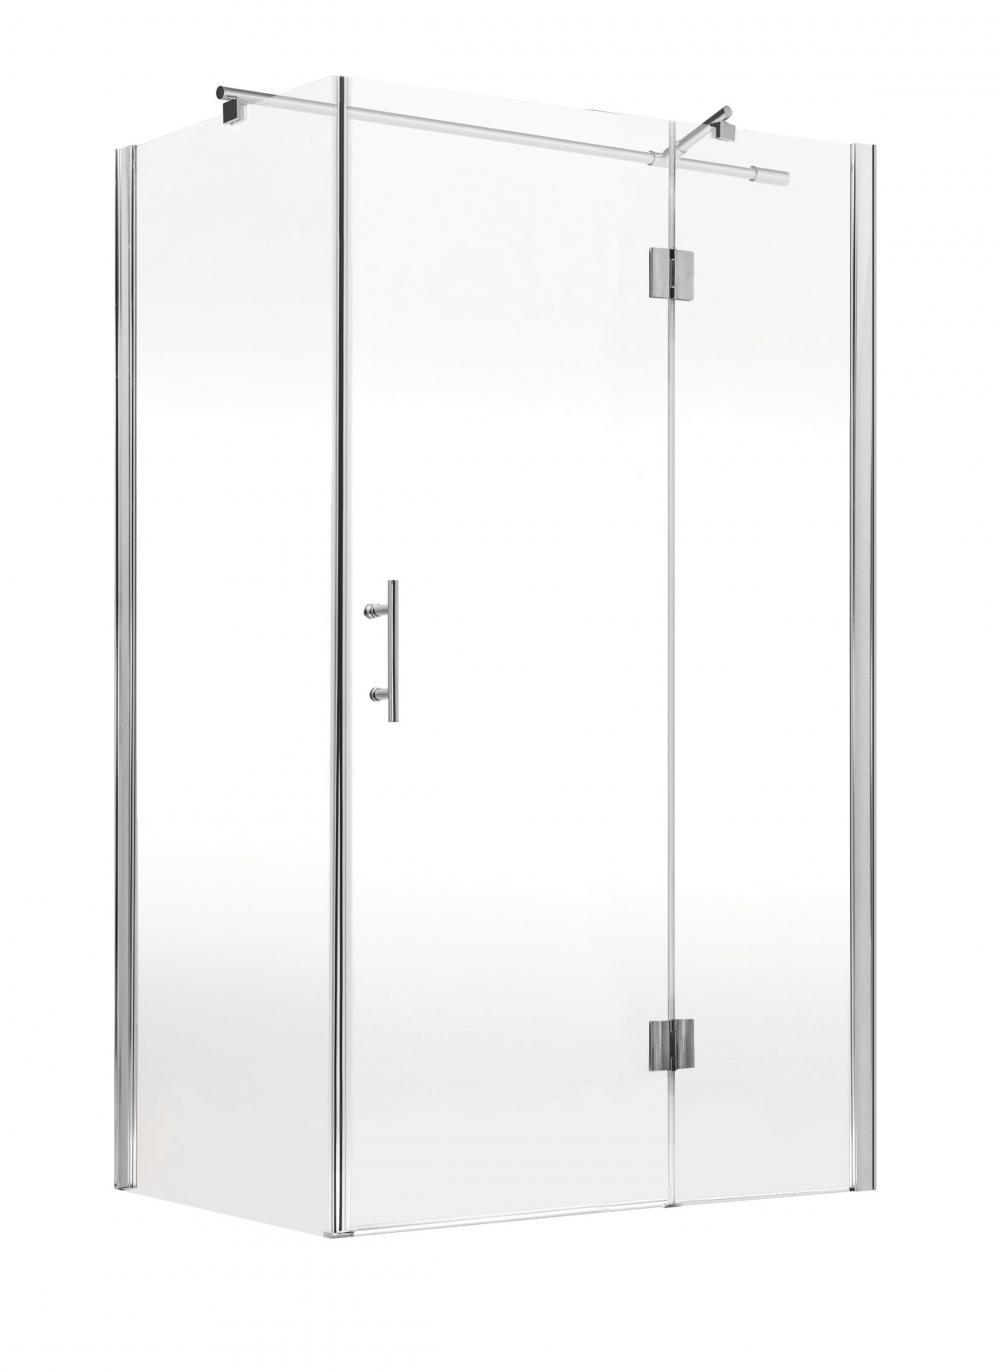 Deante Abelia szögletes zuhanykabin 120x80 cm